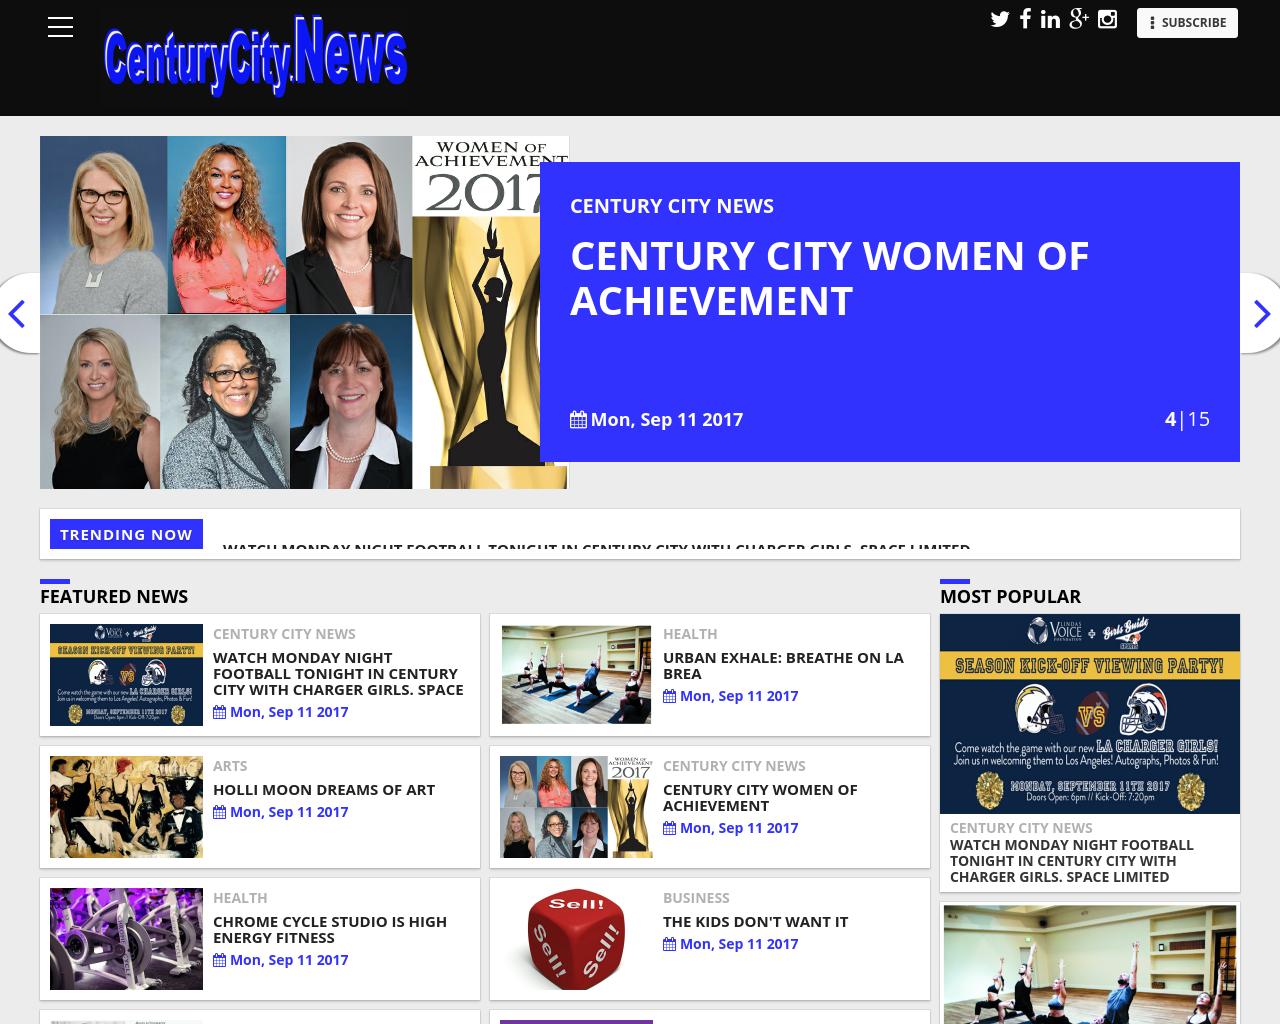 Century-City-View-Advertising-Reviews-Pricing